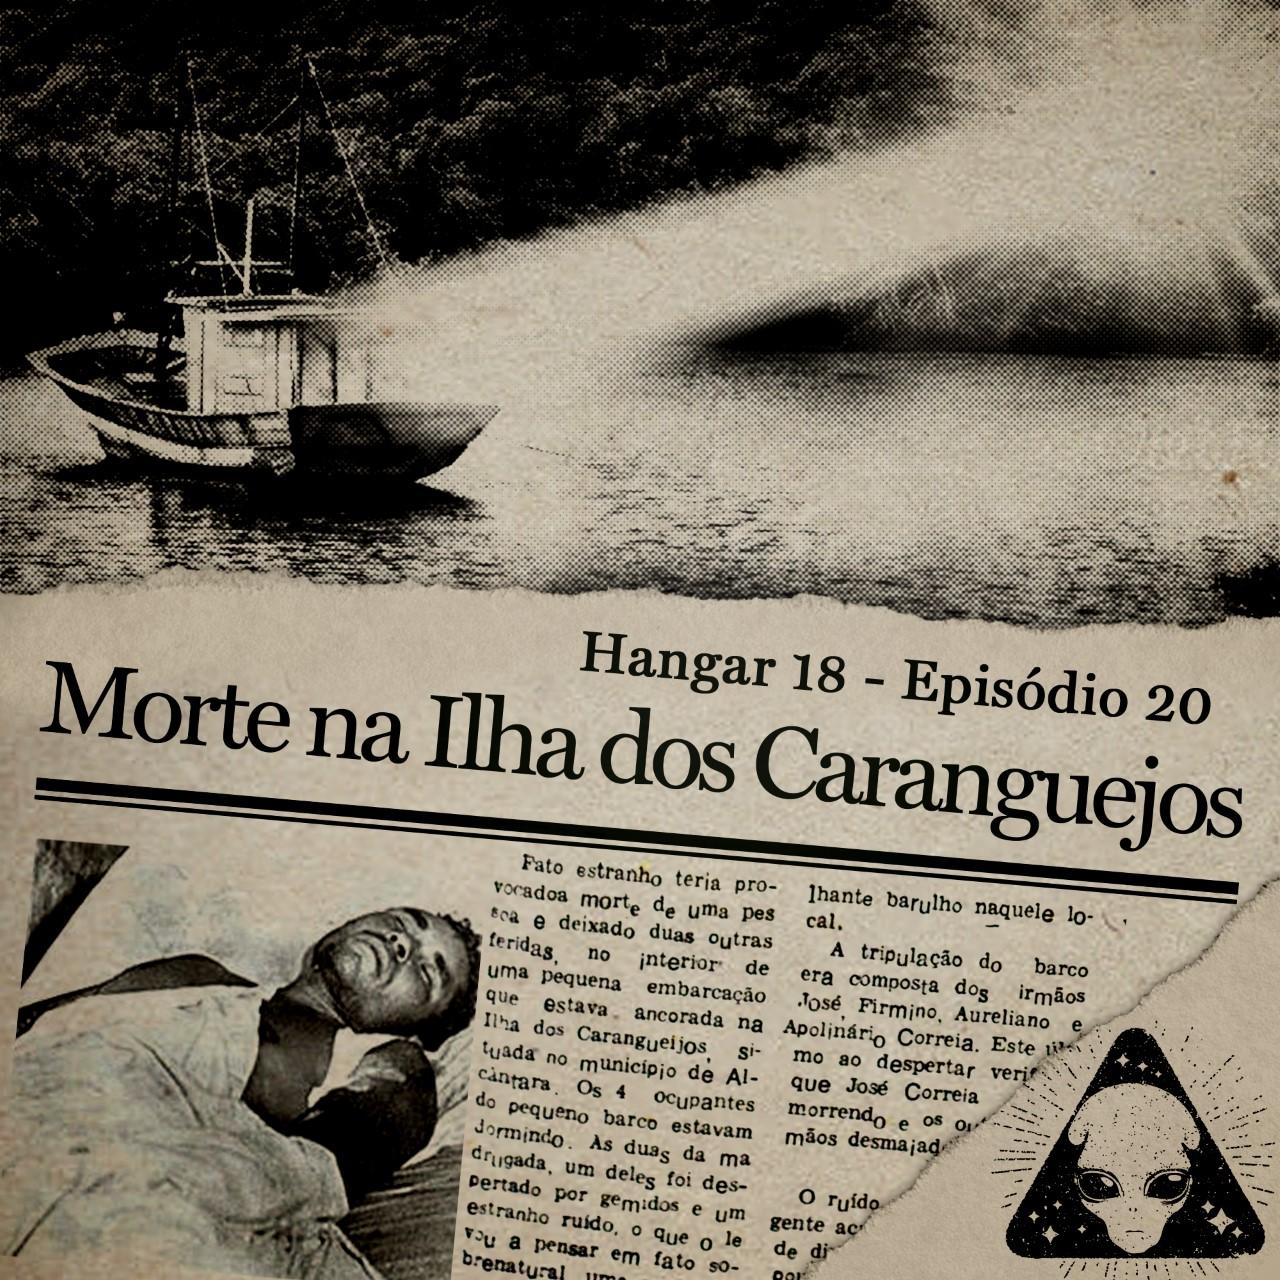 Hangar 18 - Ep 020 - Morte na Ilha do Caranguejo